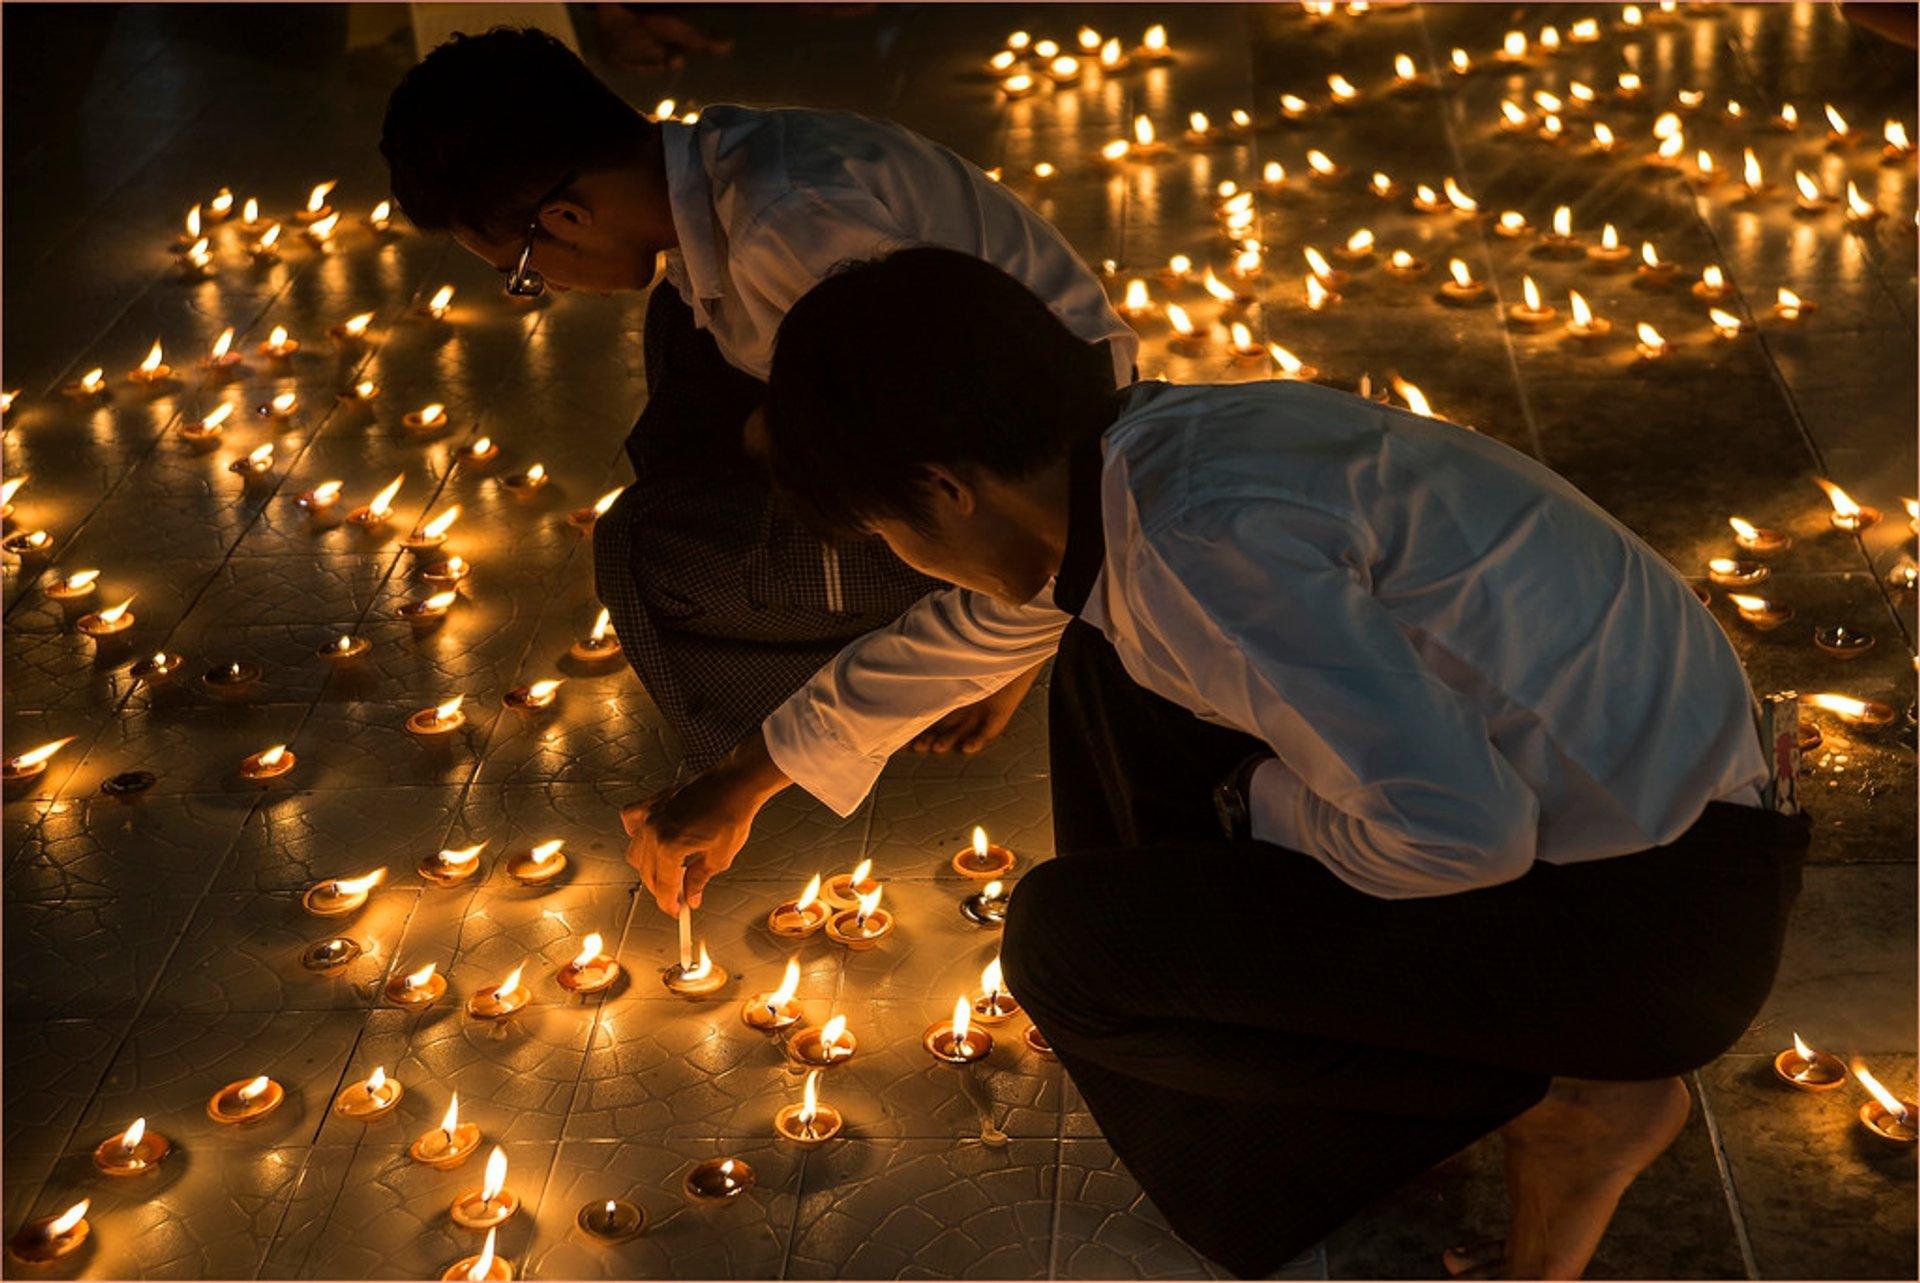 Full Moon Day of Thadingyut, Bago, Myanmar 2020